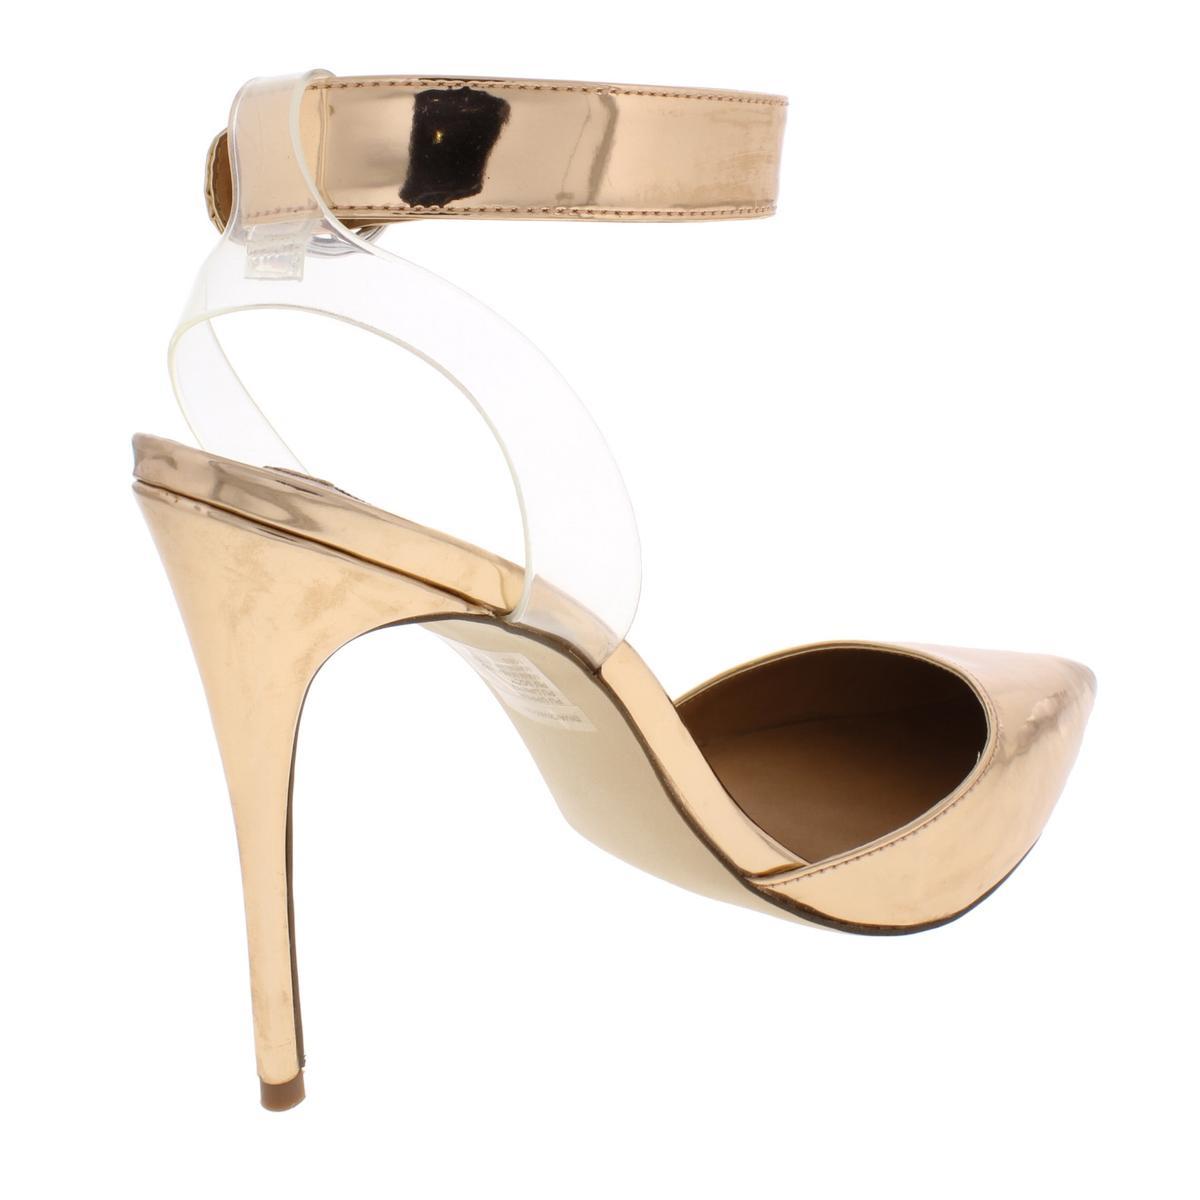 Steve-Madden-Womens-Diva-Stiletto-Pointed-Toe-Pumps-Shoes-BHFO-1554 thumbnail 6